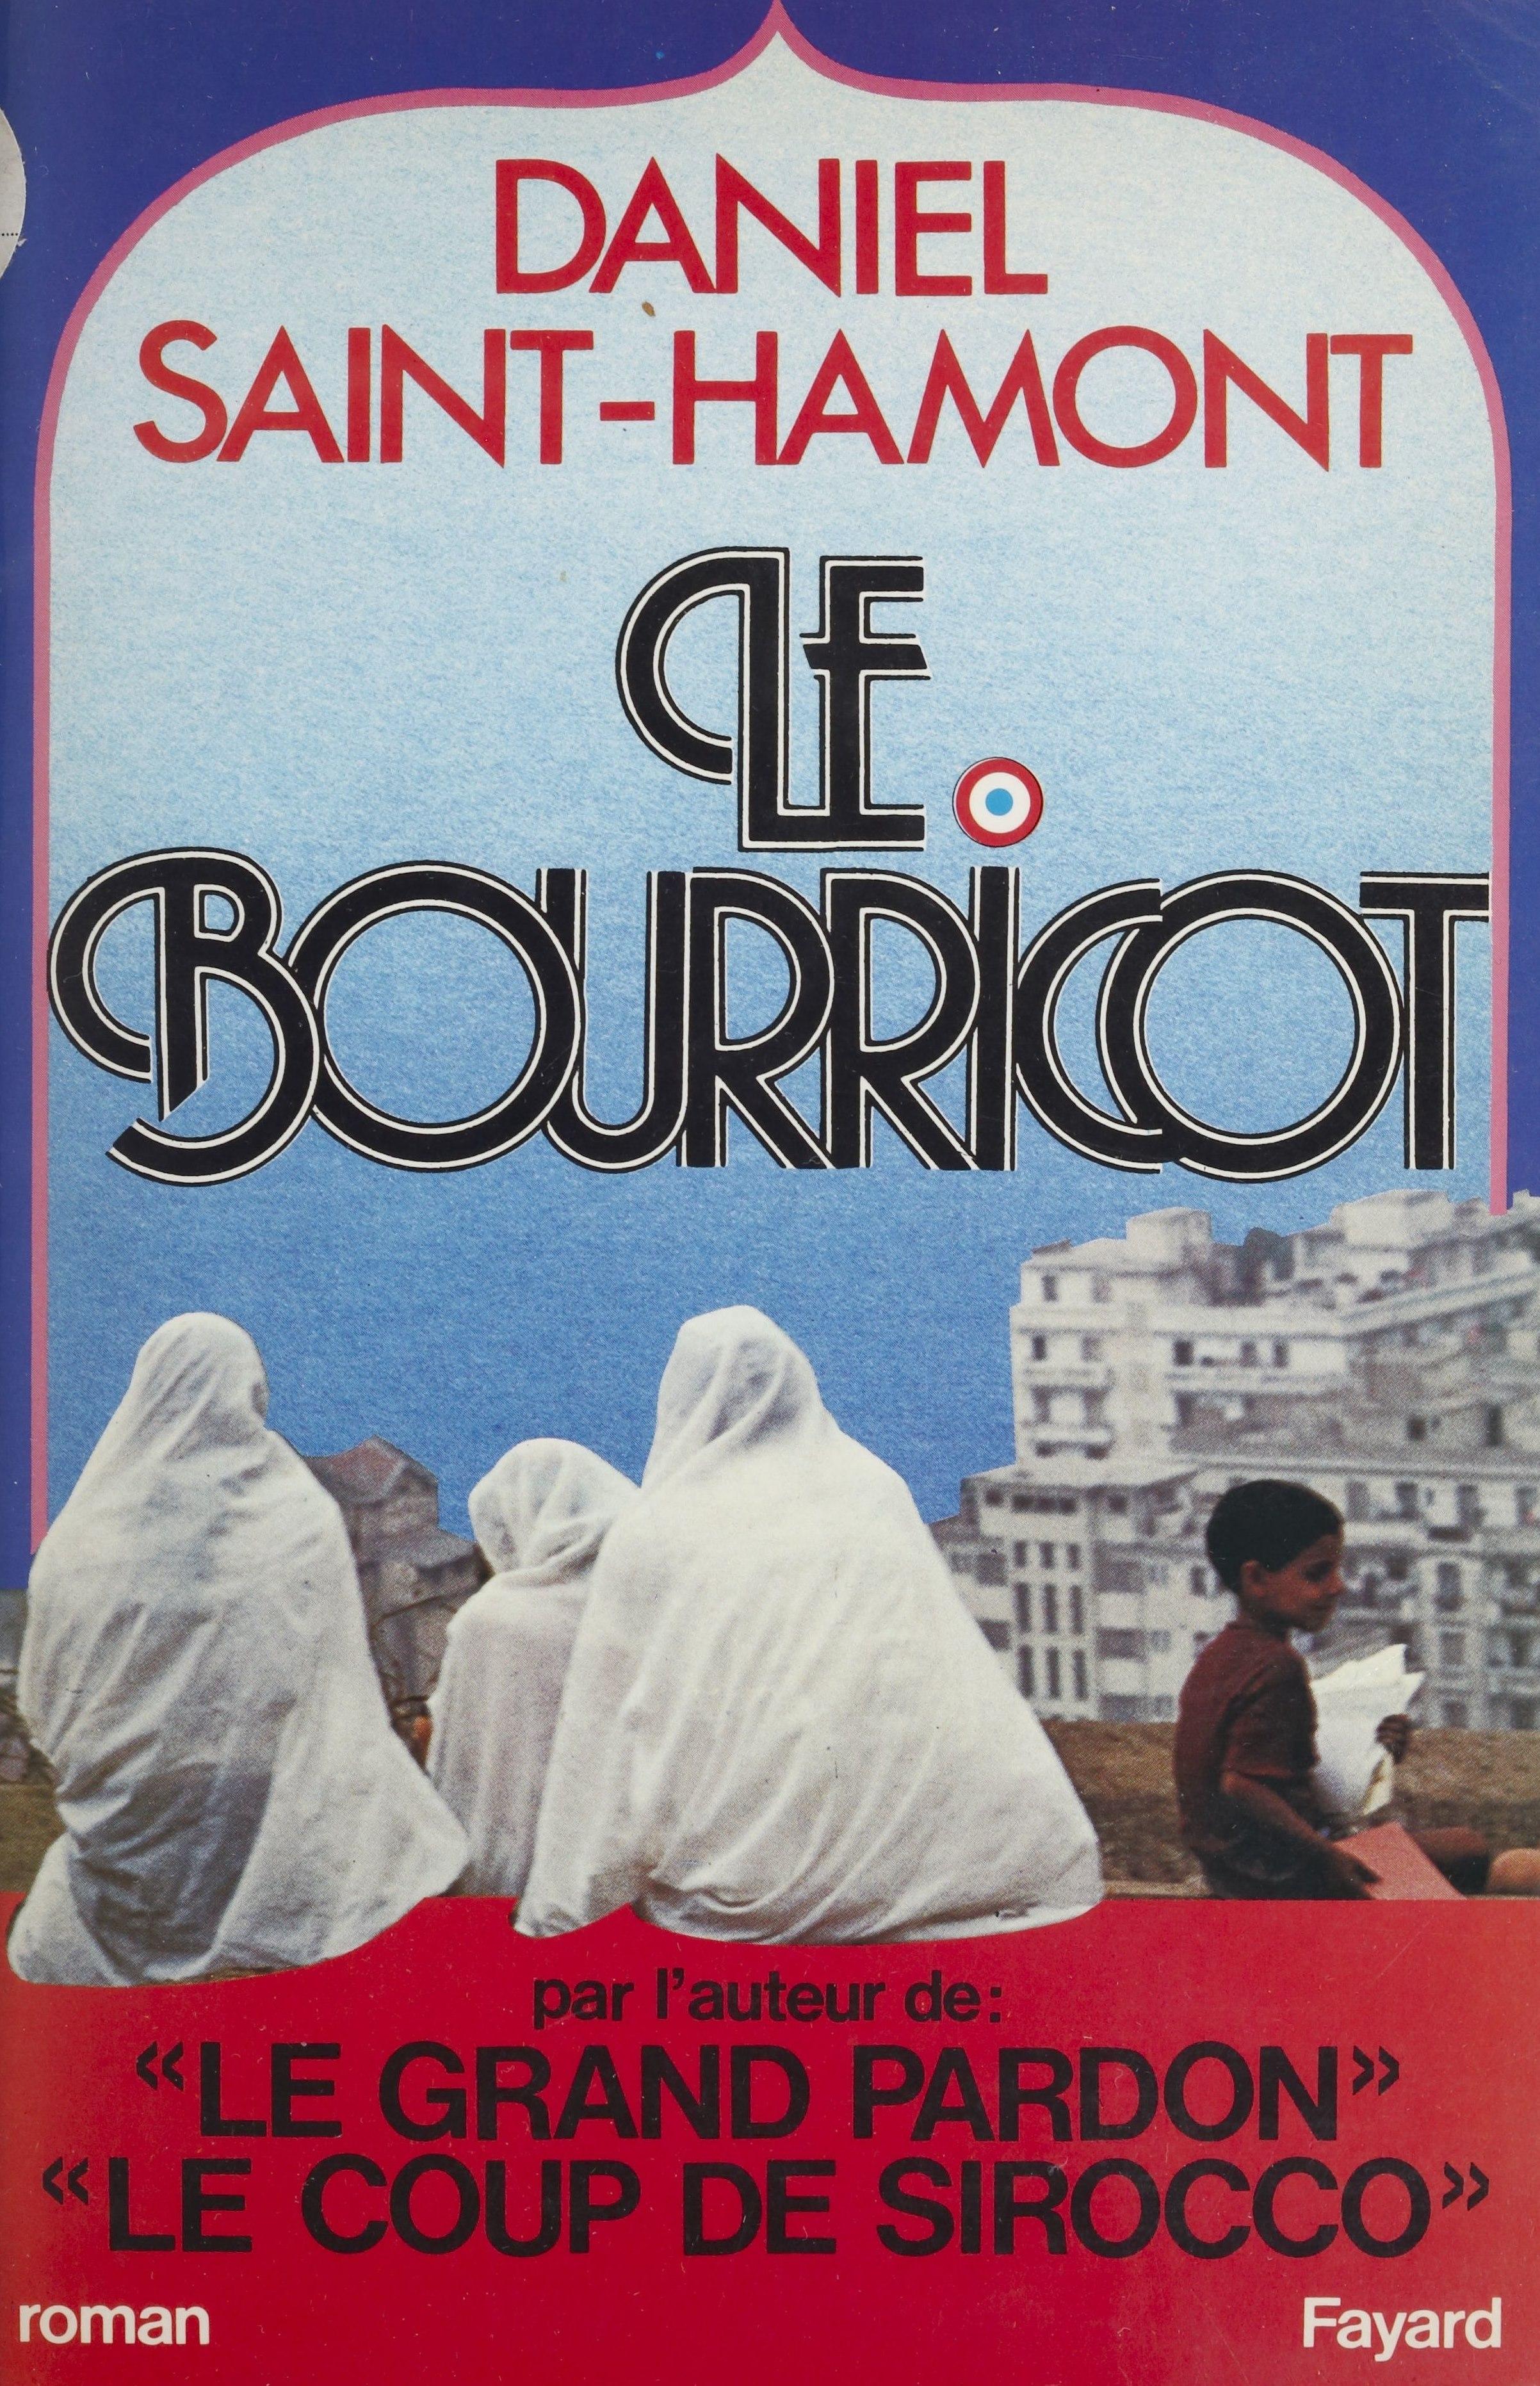 Le Bourricot